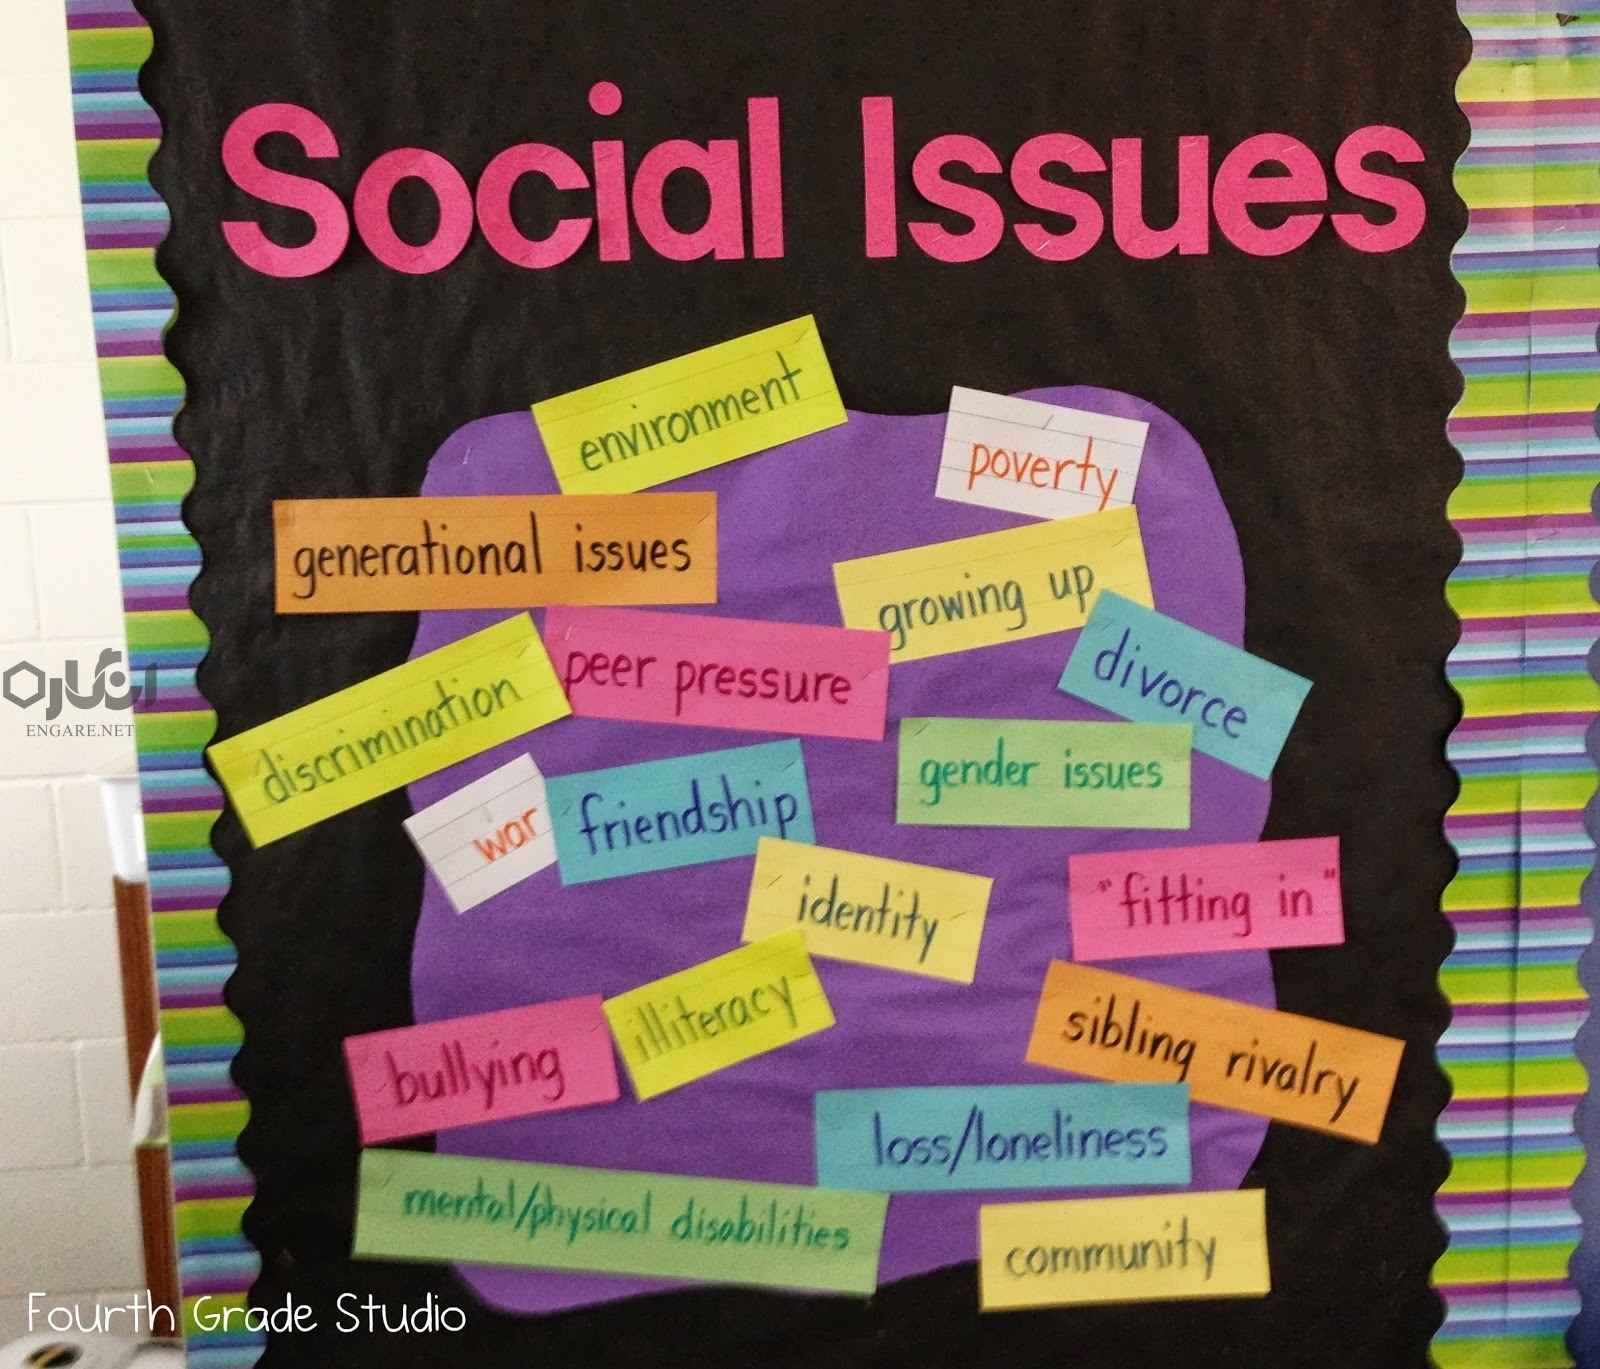 IMAGE BFE72AA5 B2EE 465D 9F17 4FE8F1894D50 - مسائل اجتماعى - هربرت اسپنسر, مسئله اجتماعی, جامعه شناسی, آگوست کنت, آسیب شناسی, Social issues